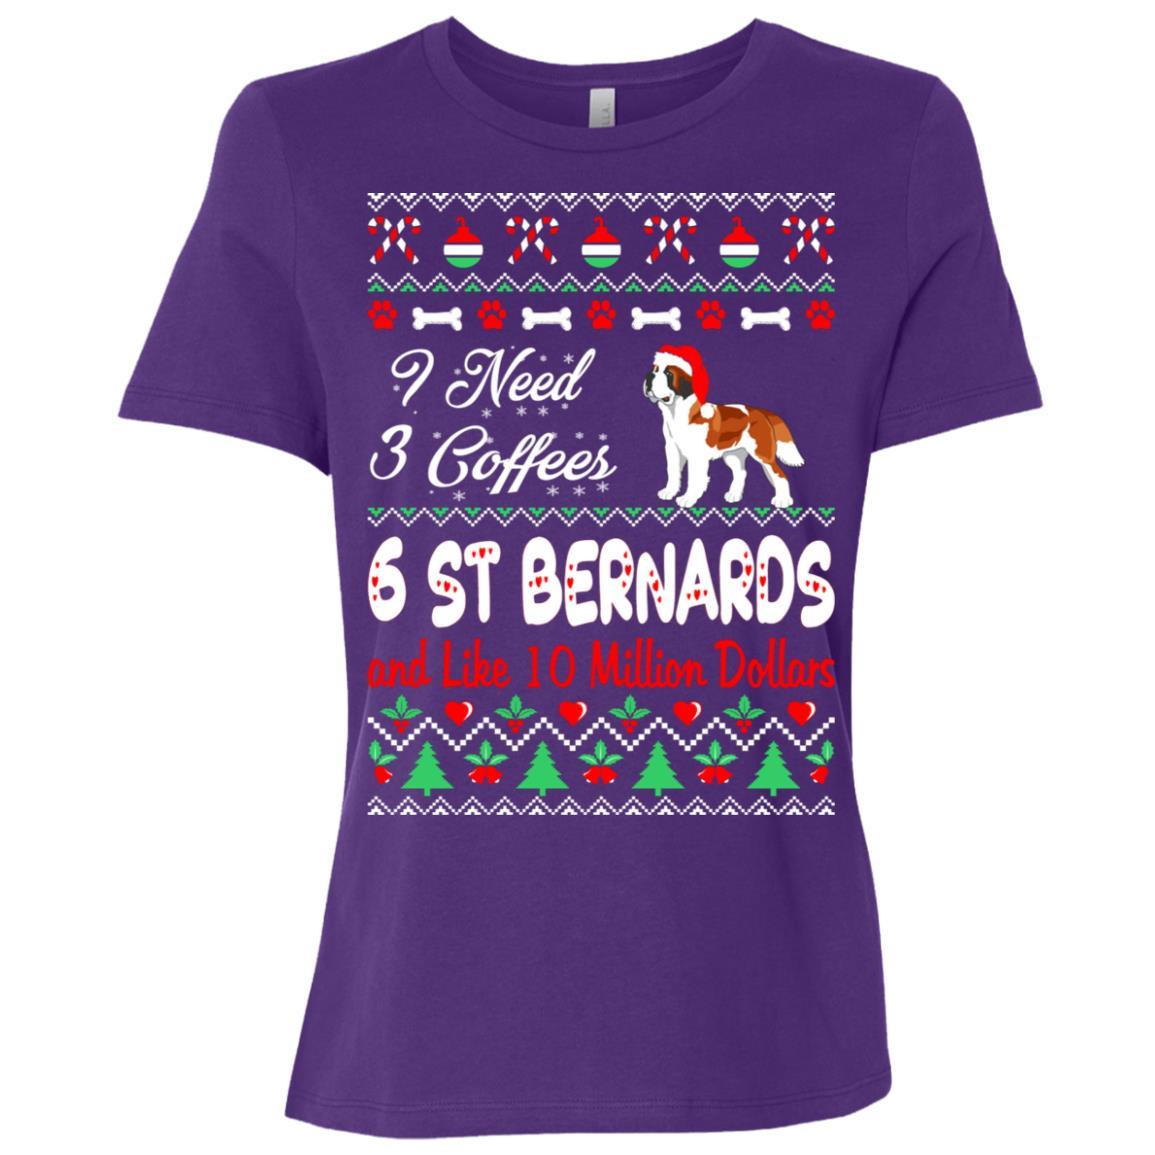 Need 3 Coffees 6 St Bernards Christmas Ugly Sweater Women Short Sleeve T-Shirt